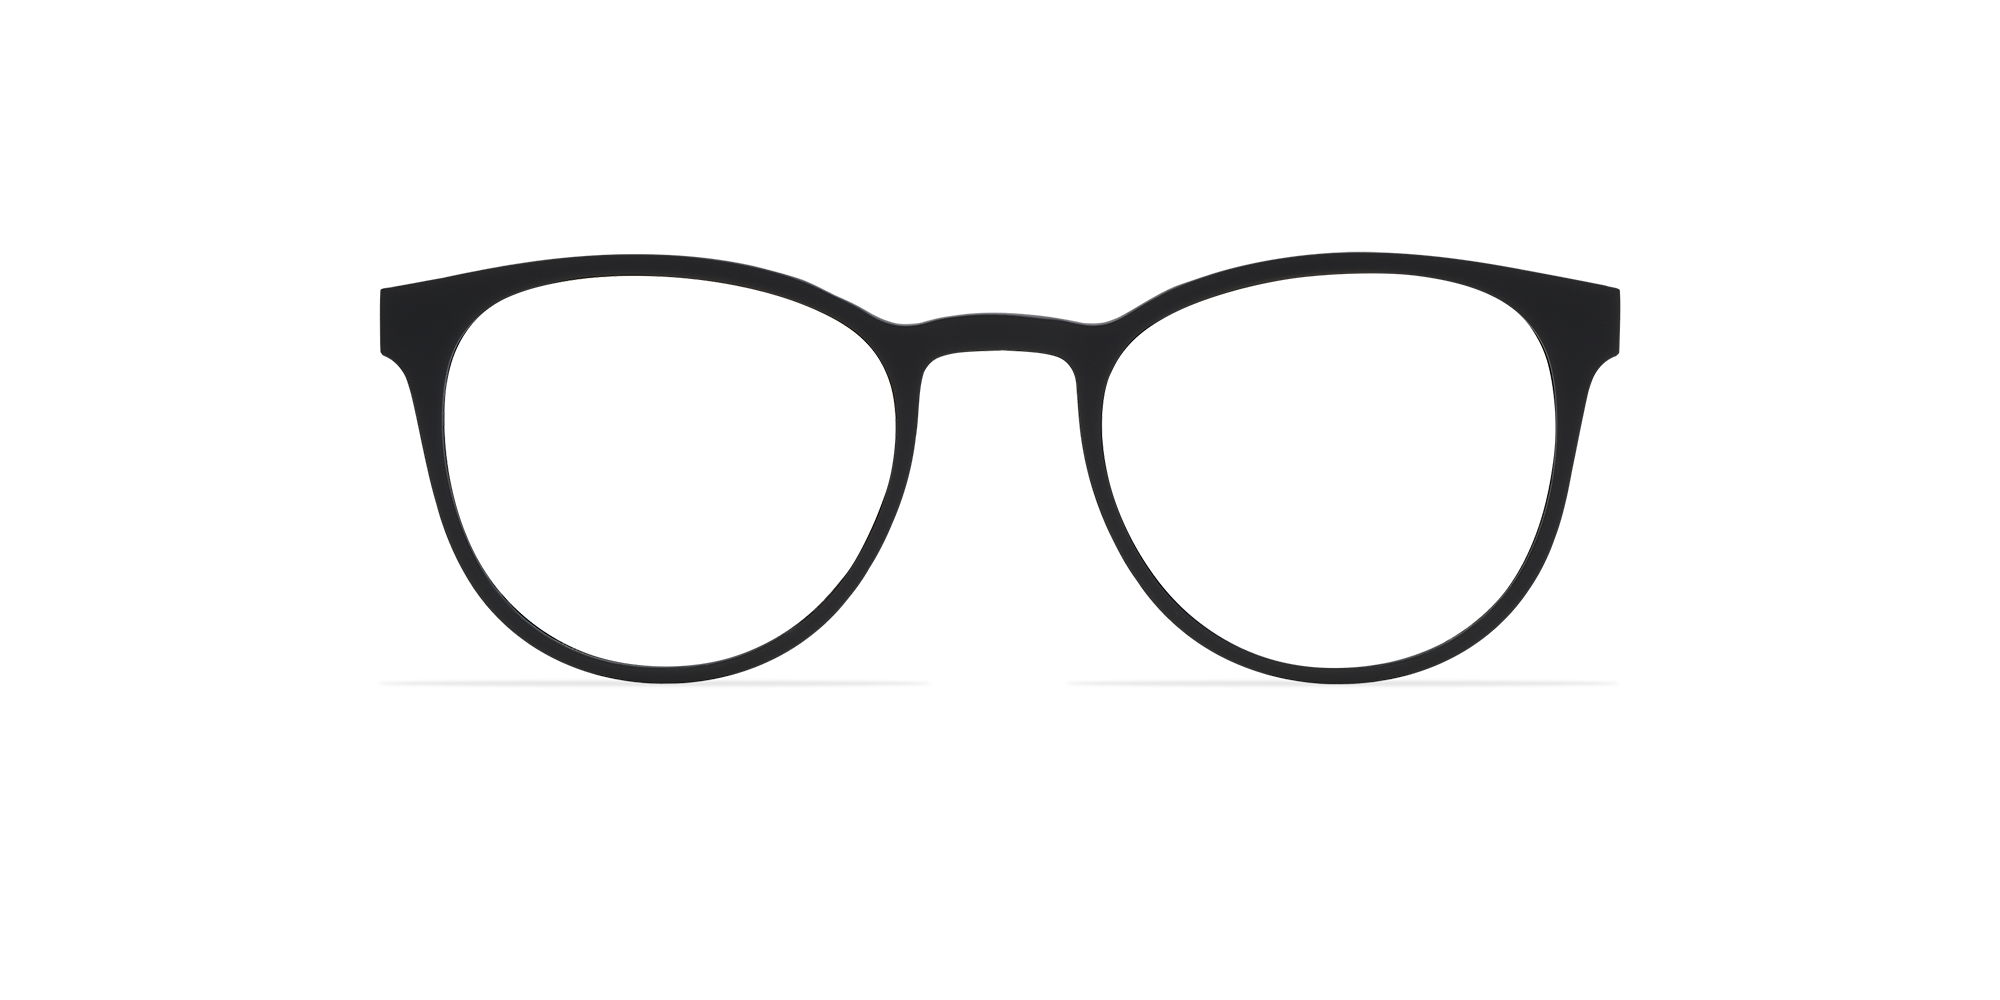 afflelou/france/products/smart_clip/clips_glasses/TMK44BBBK014920.png